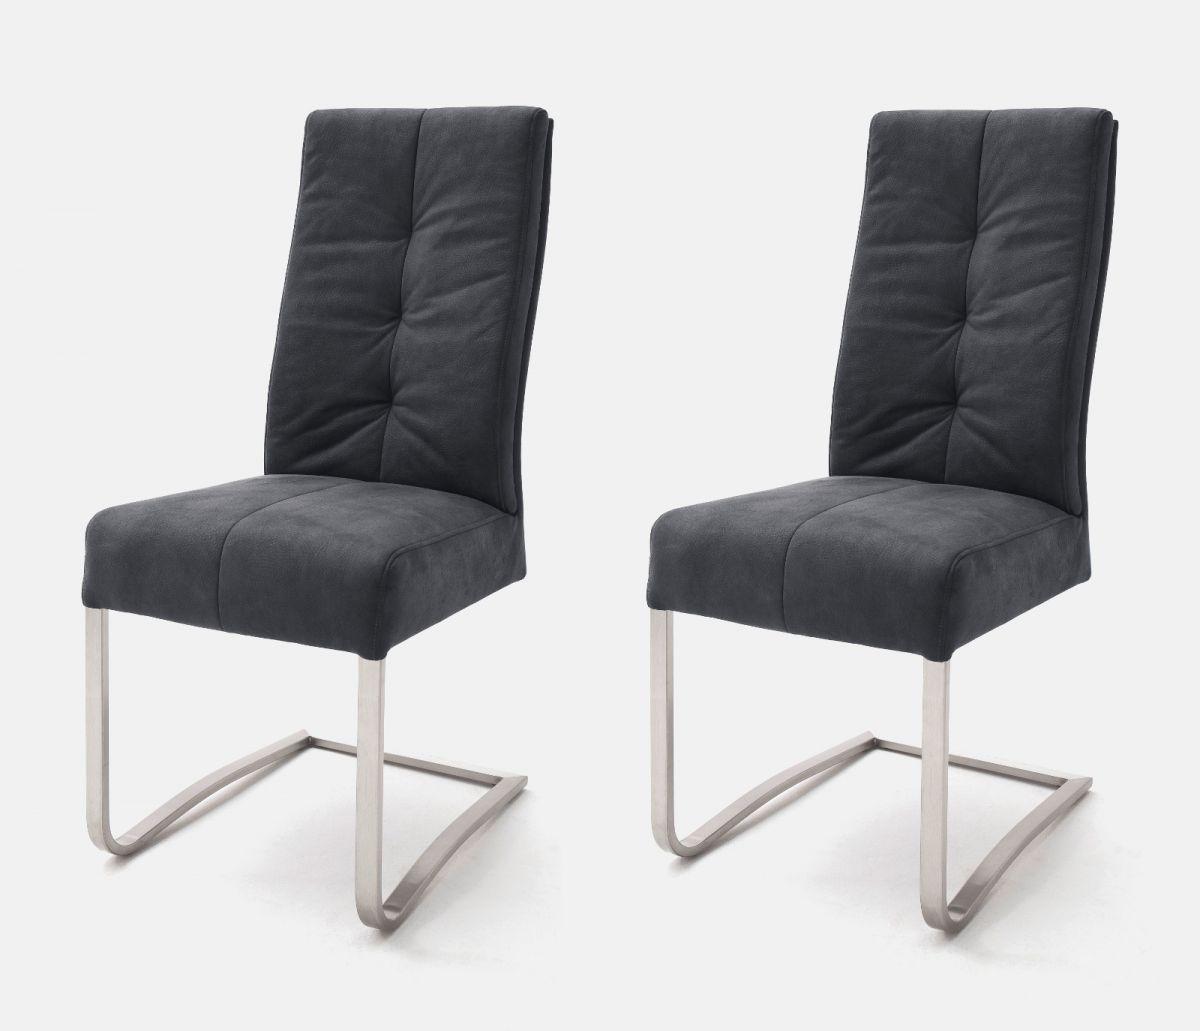 2 x Stuhl Salva Schwarz Schwinger